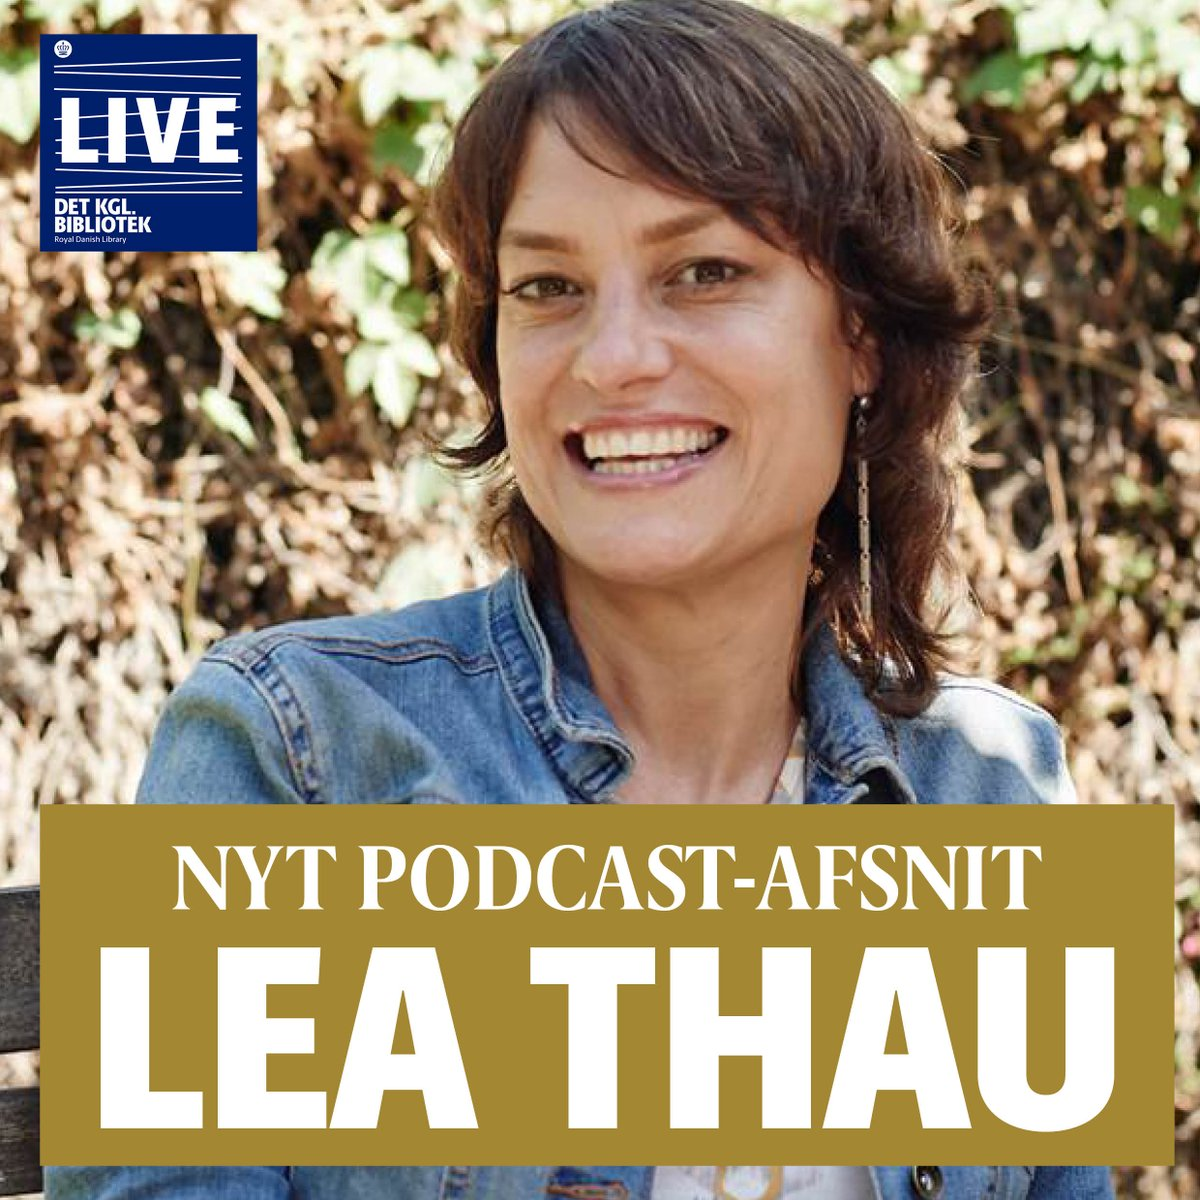 Lea thau strangers